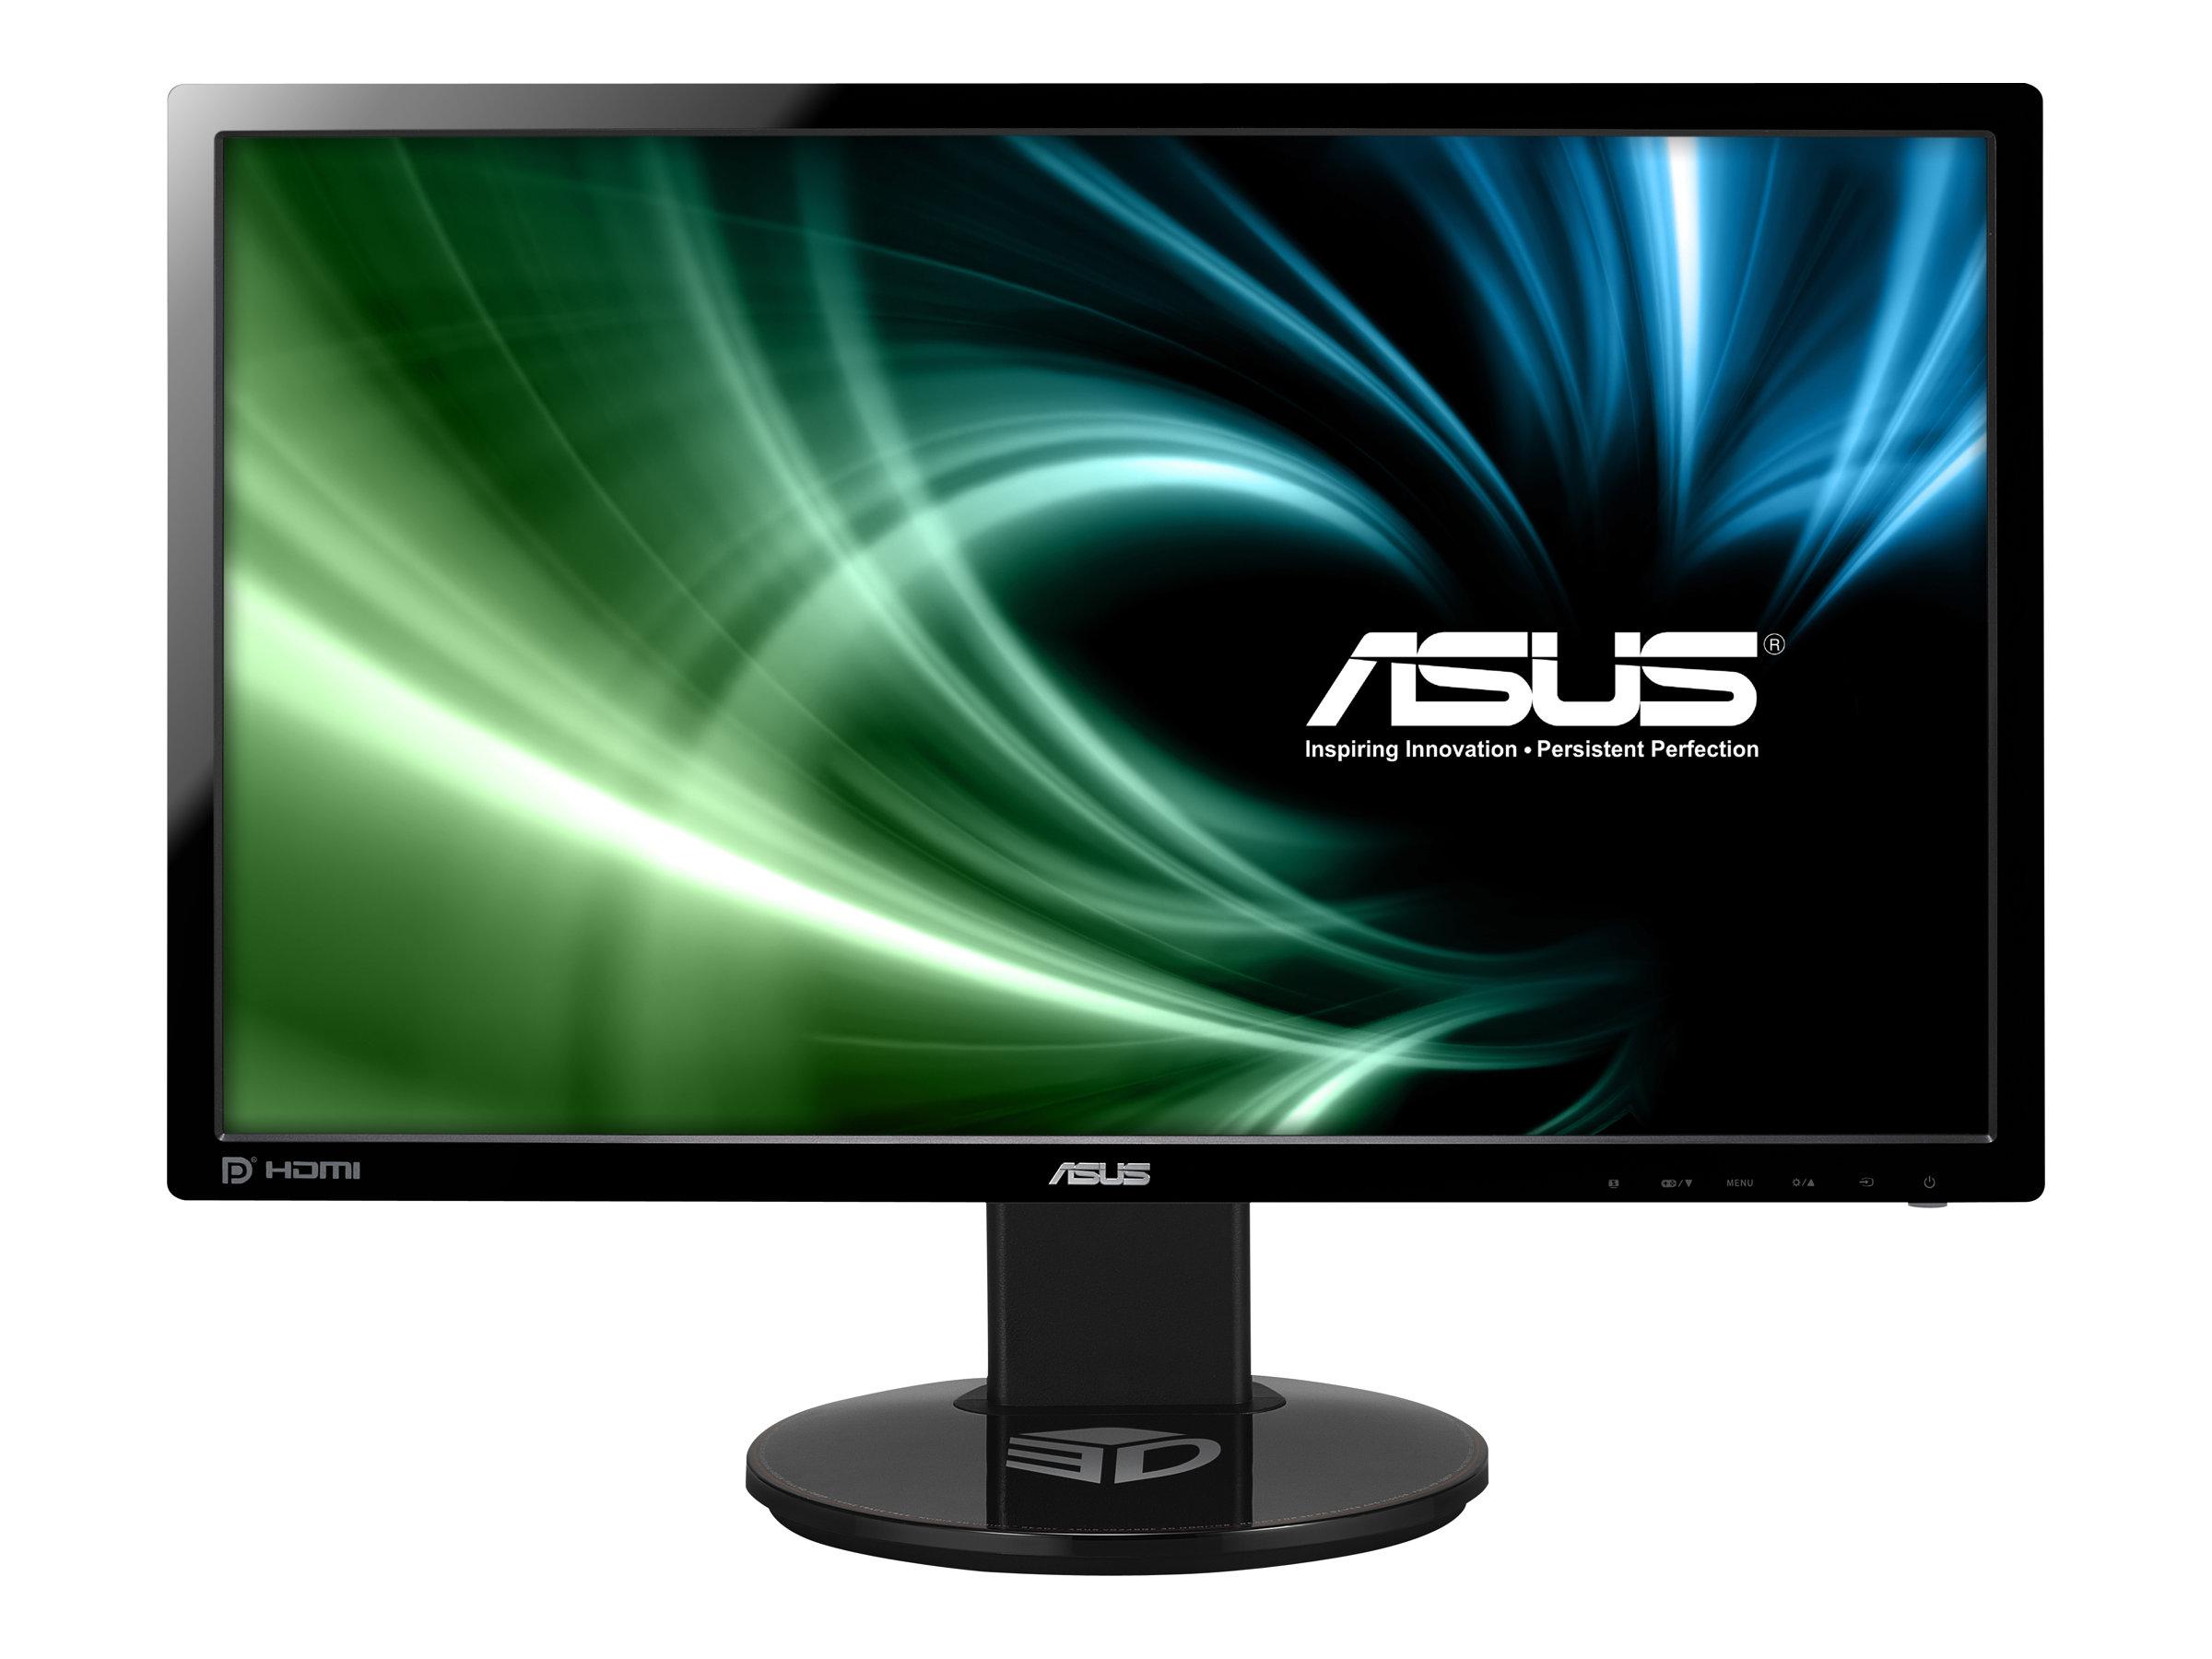 ASUS VG248QE - 3D LED-Monitor - 61 cm (24